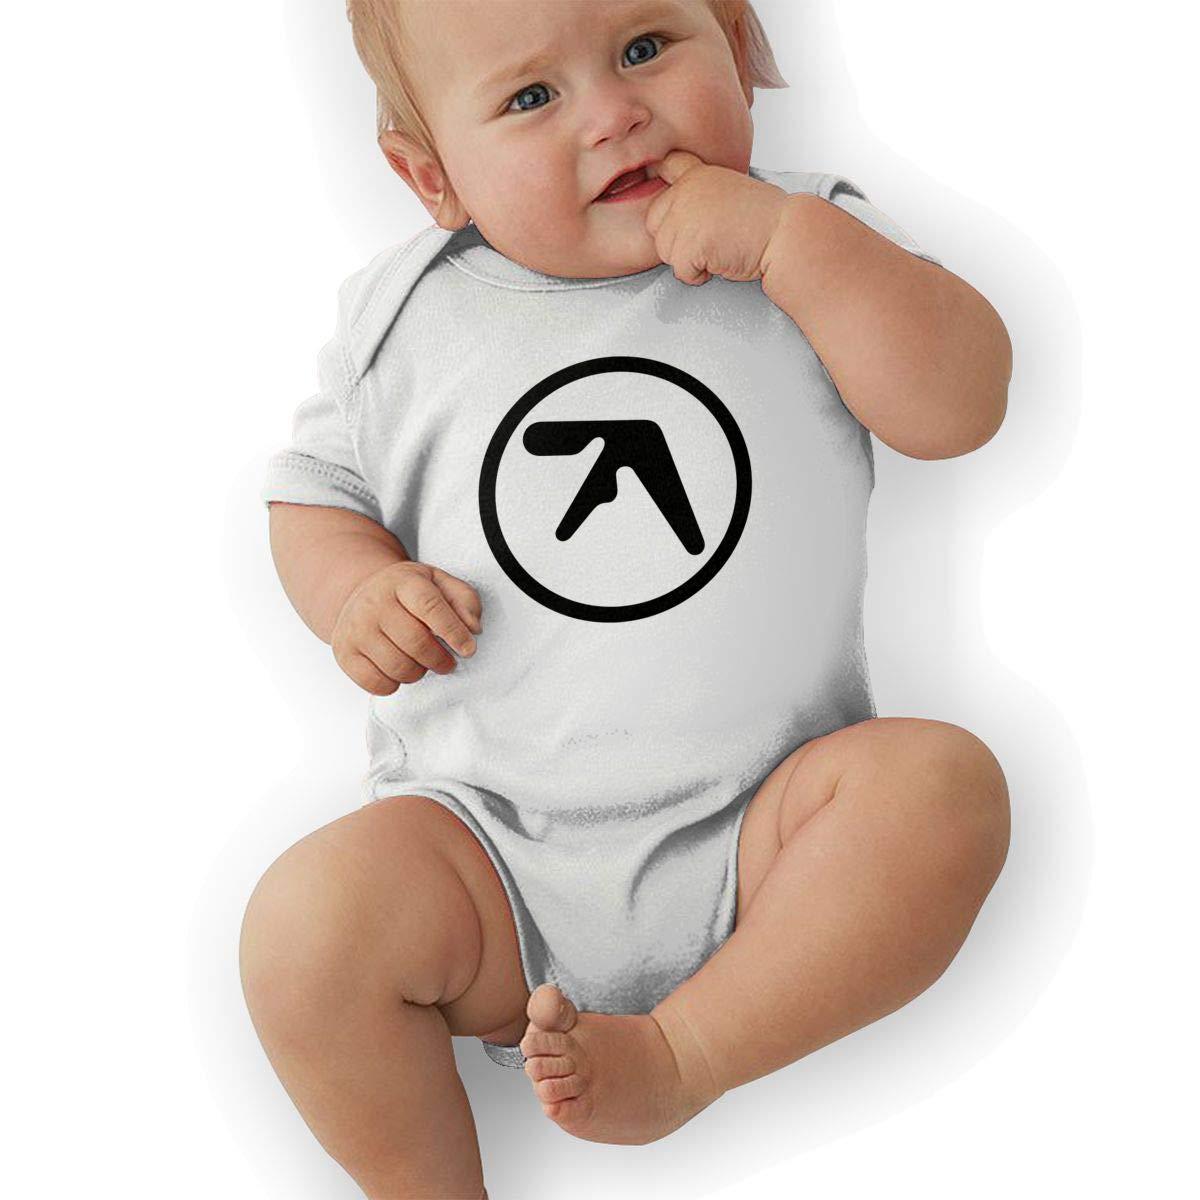 LuckyTagy Aphex Twin Logo Unisex Funny Newborn Baby Romper Baby GirlOutfits White